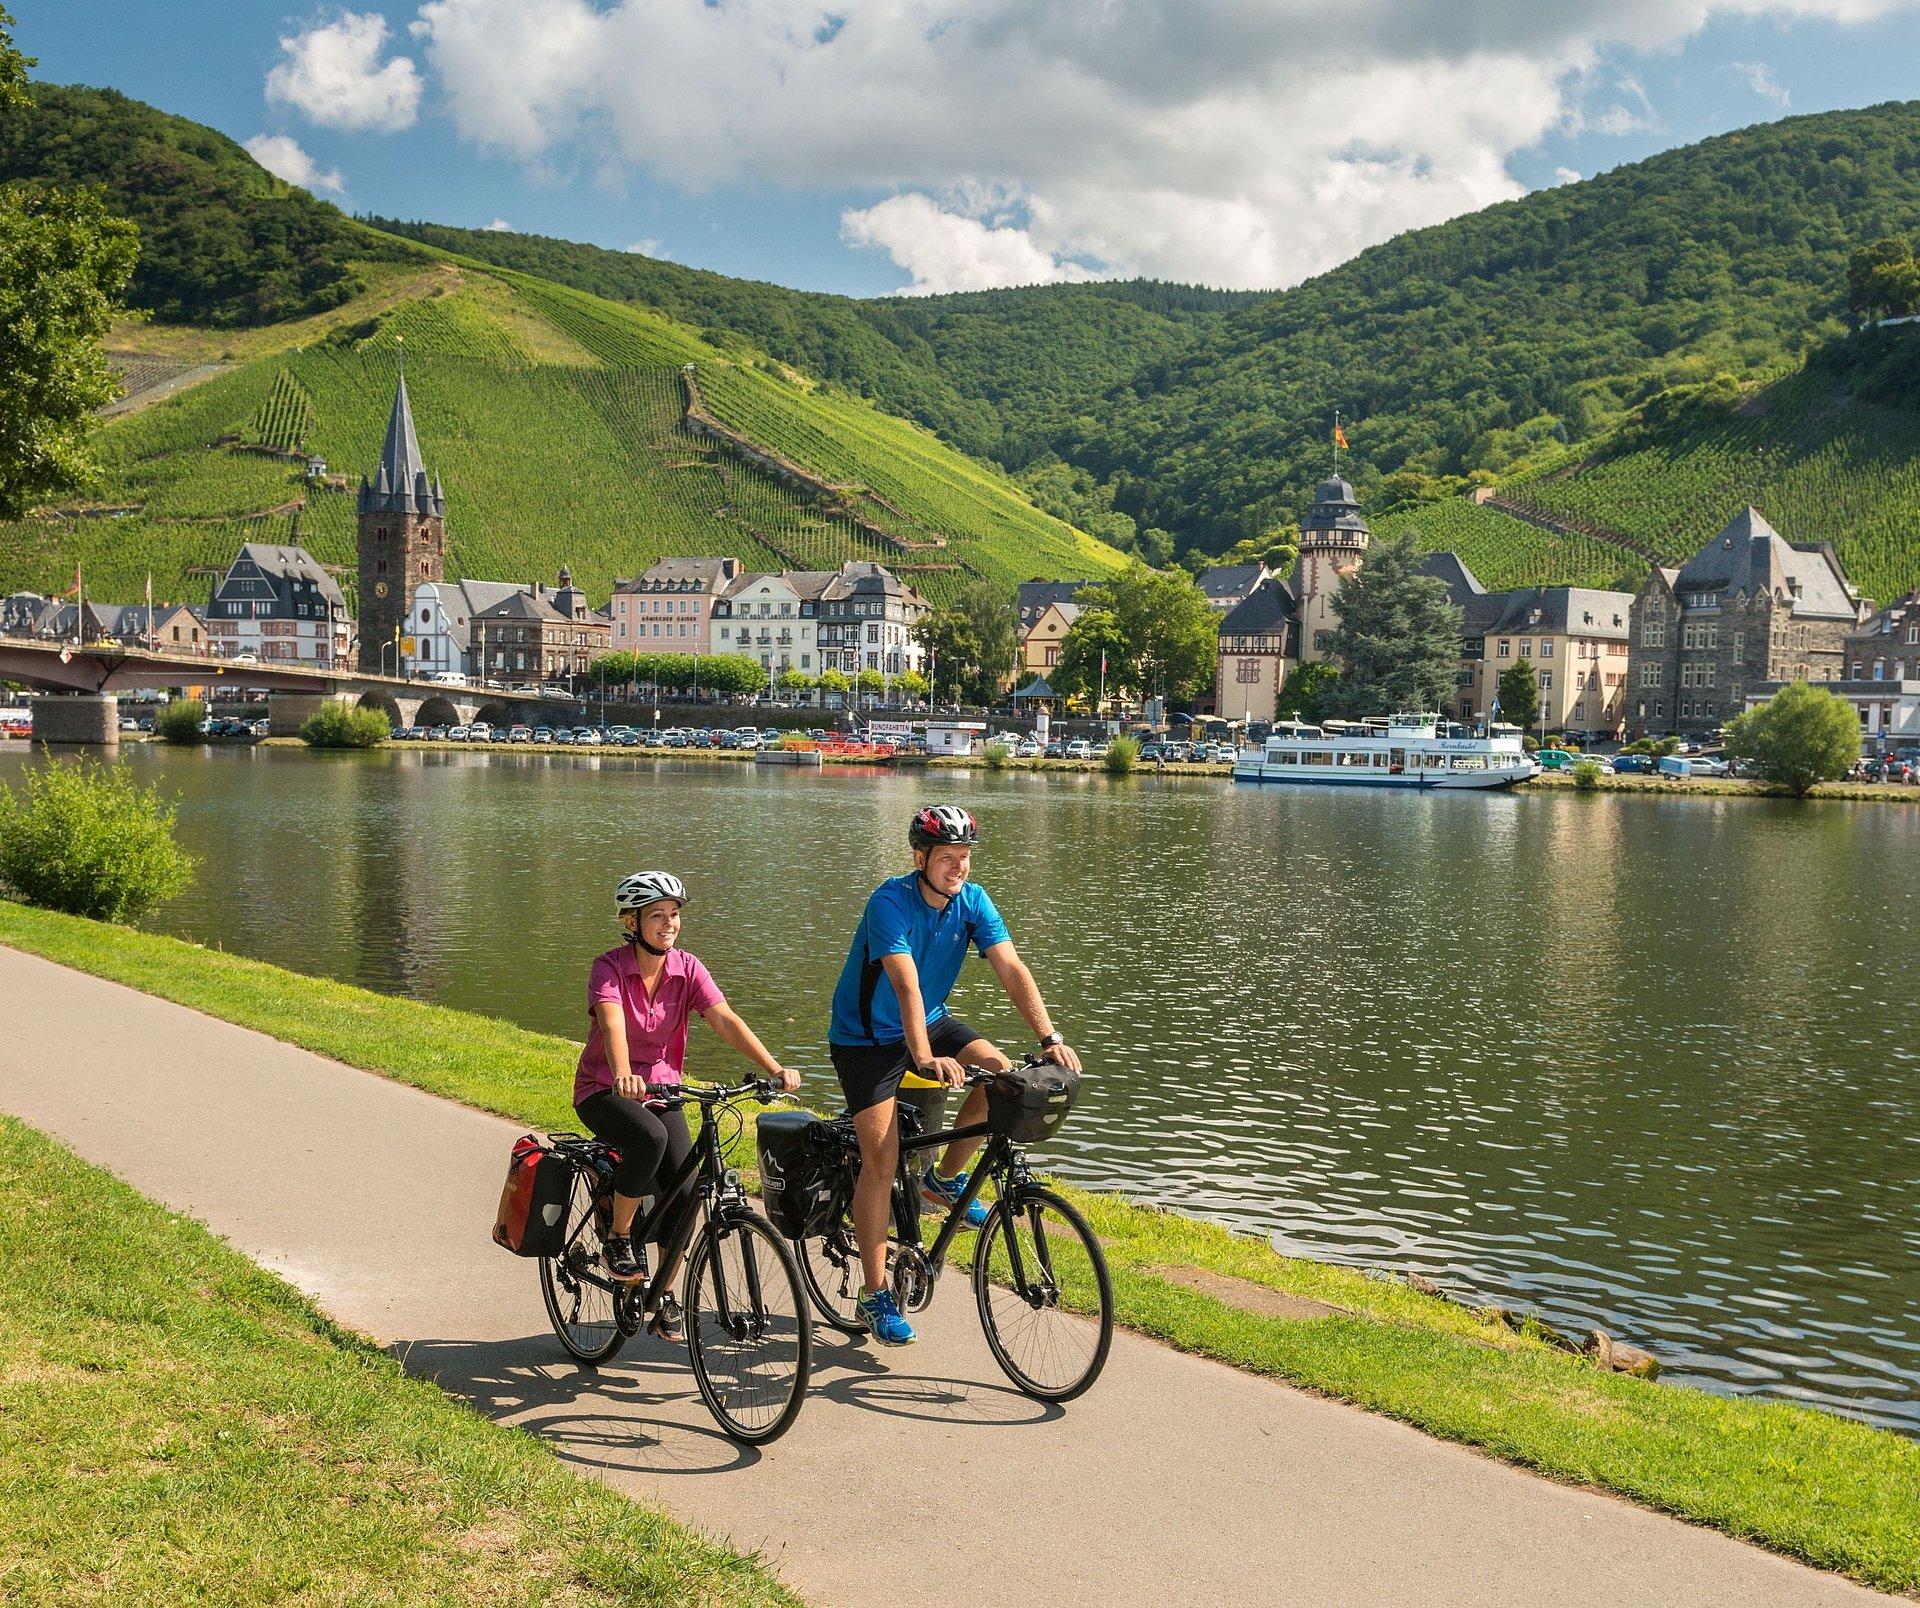 Radtour auf dem Mosel-Radweg bei Bernkastel-Kues, Mosel